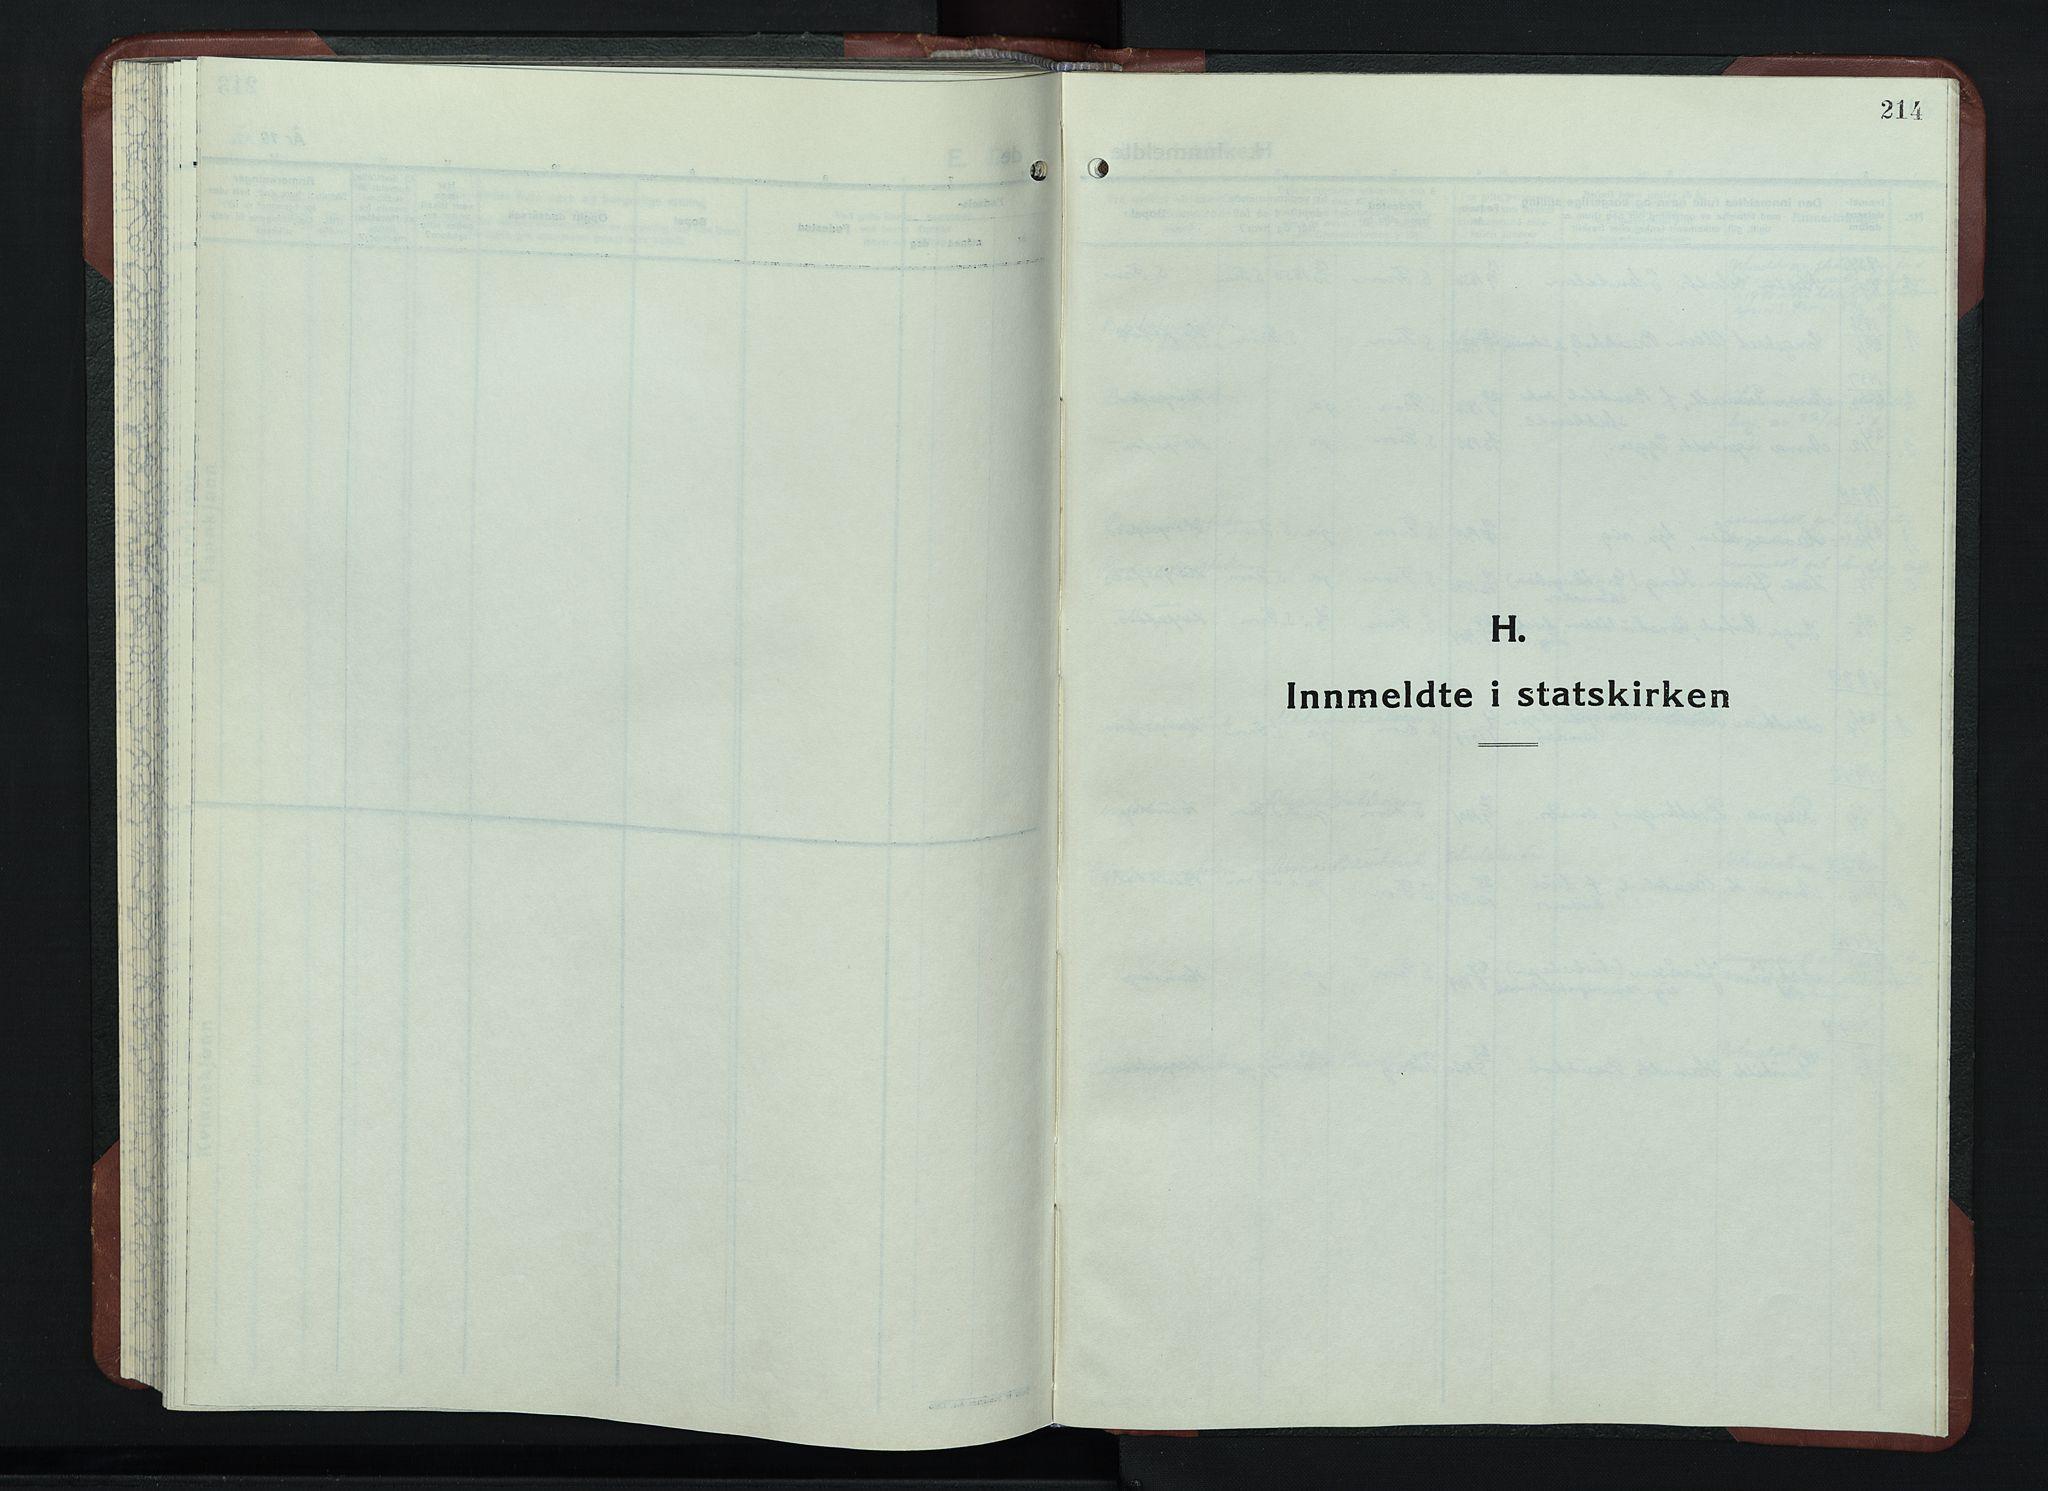 SAH, Sør-Fron prestekontor, H/Ha/Hab/L0006: Klokkerbok nr. 6, 1933-1948, s. 214